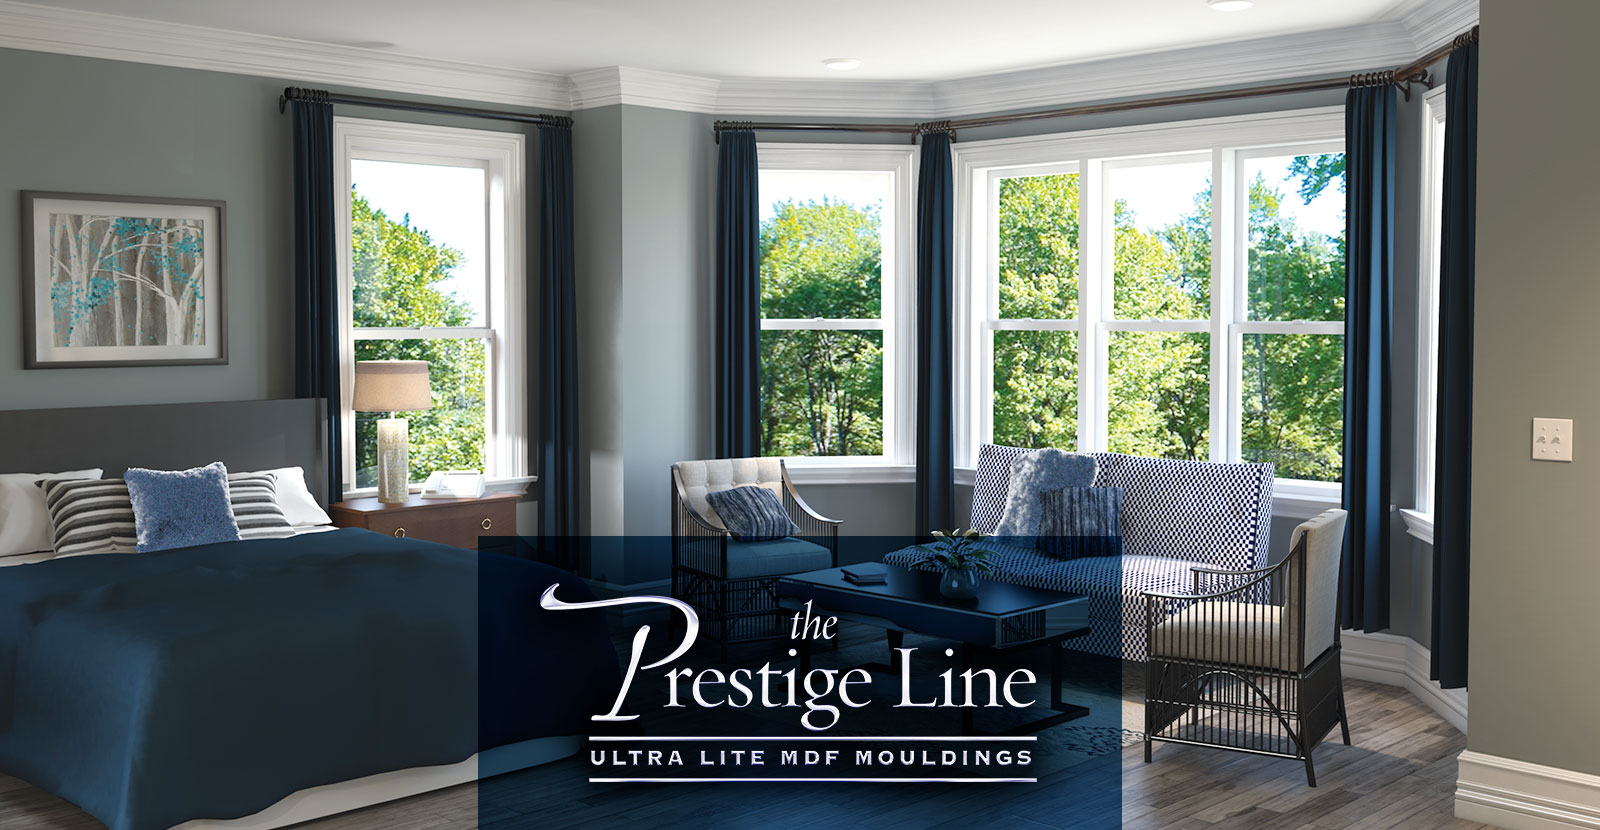 The Prestige Line